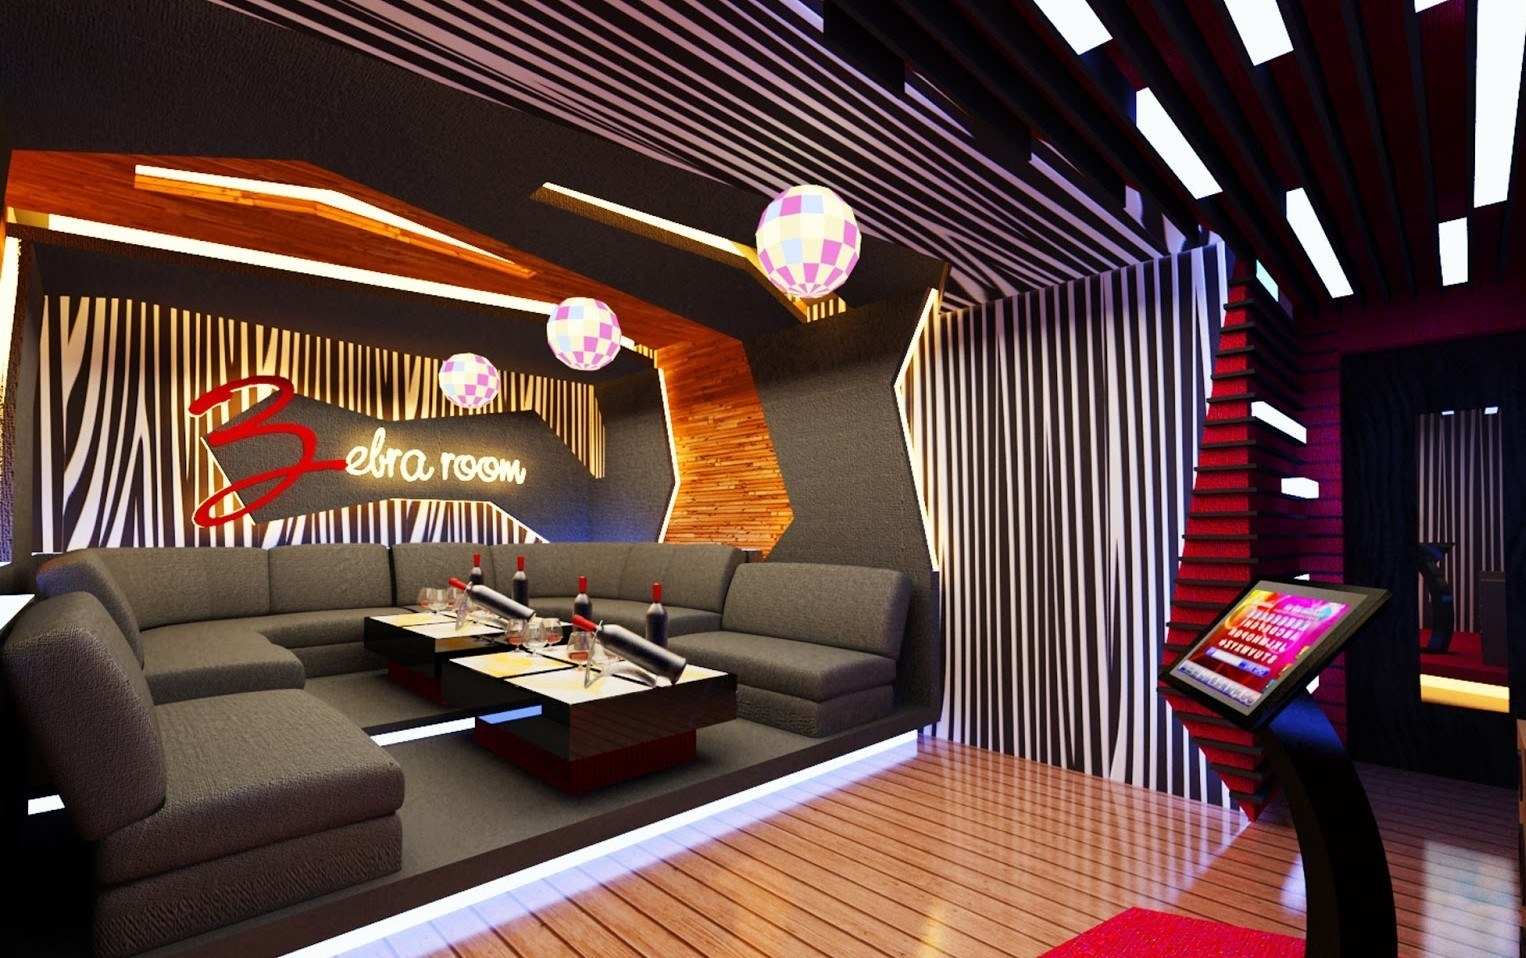 thiet-ke-phong-hat-karaoke-binh-dan-9